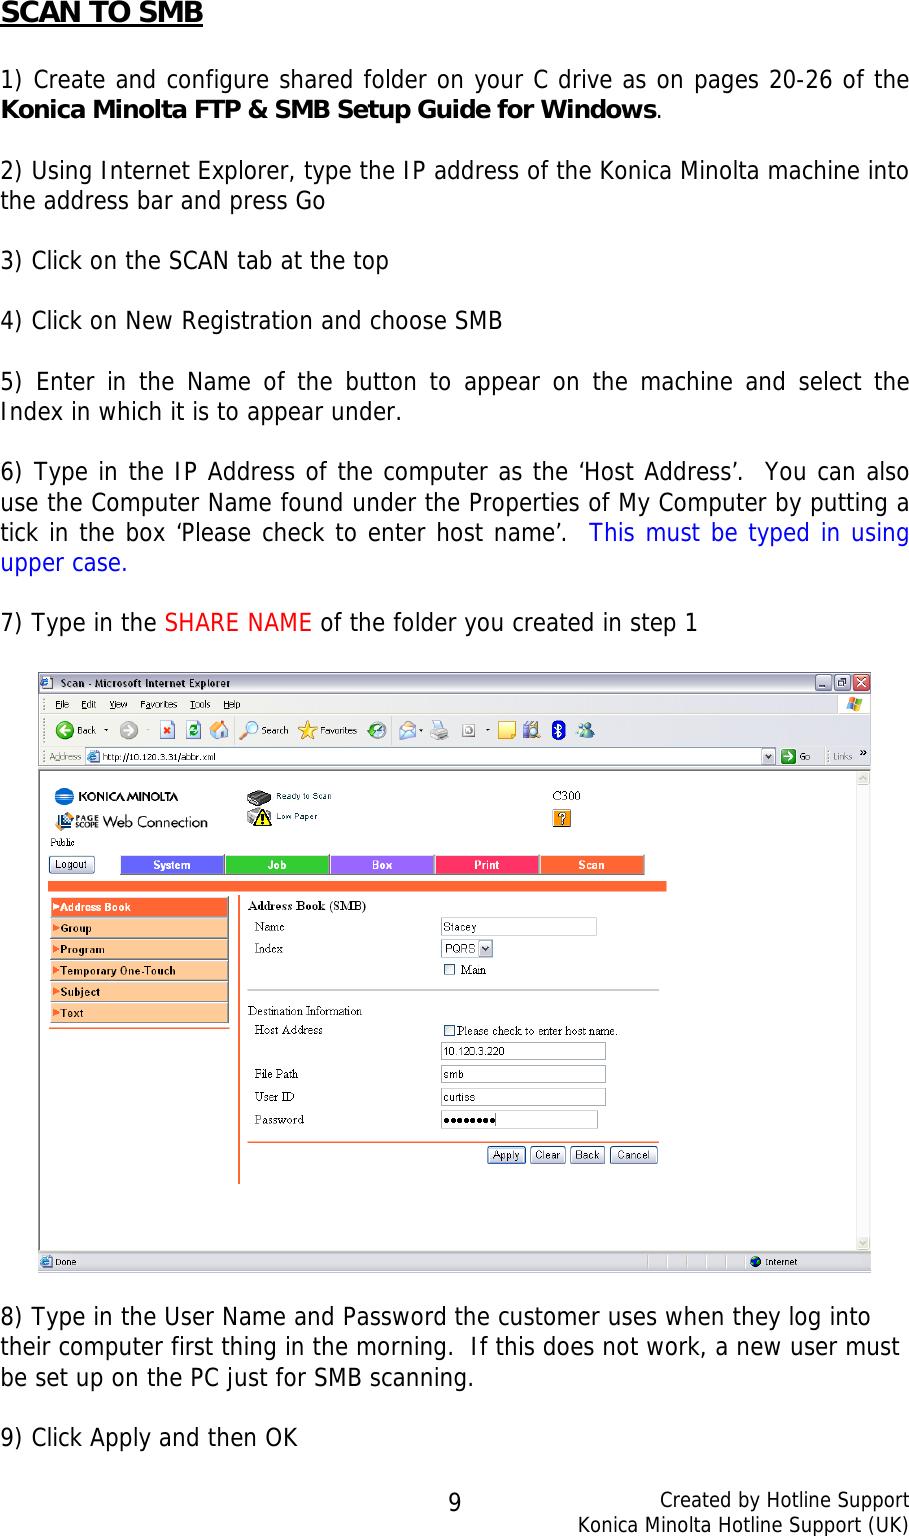 Konica Minolta Bizhub C300 Users Manual Scanning Guide V6 0_Colour_V1 2